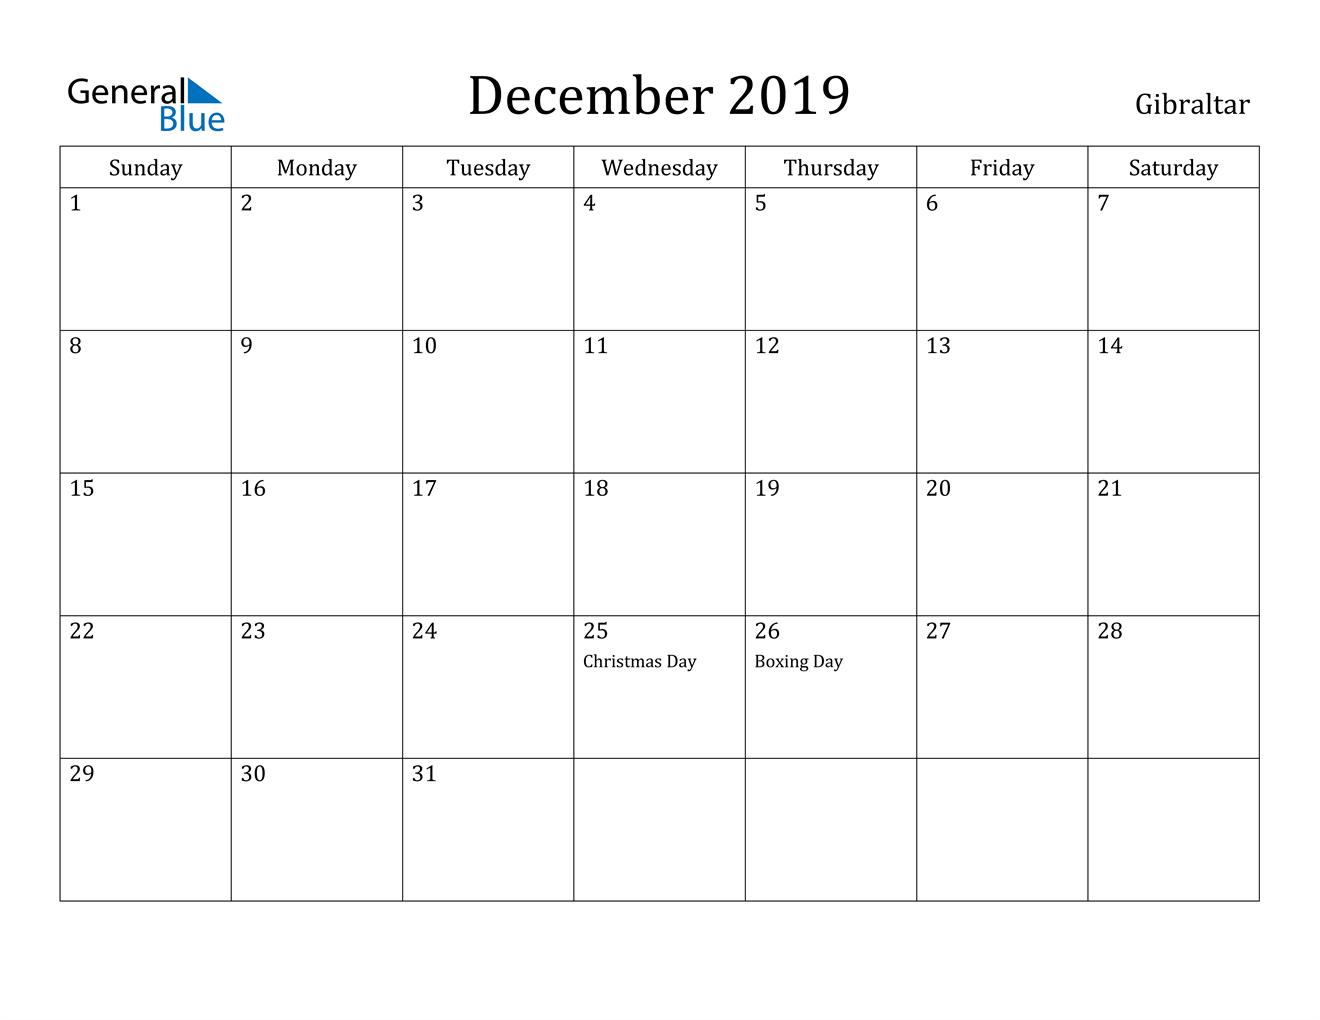 Image of December 2019 Gibraltar Calendar with Holidays Calendar